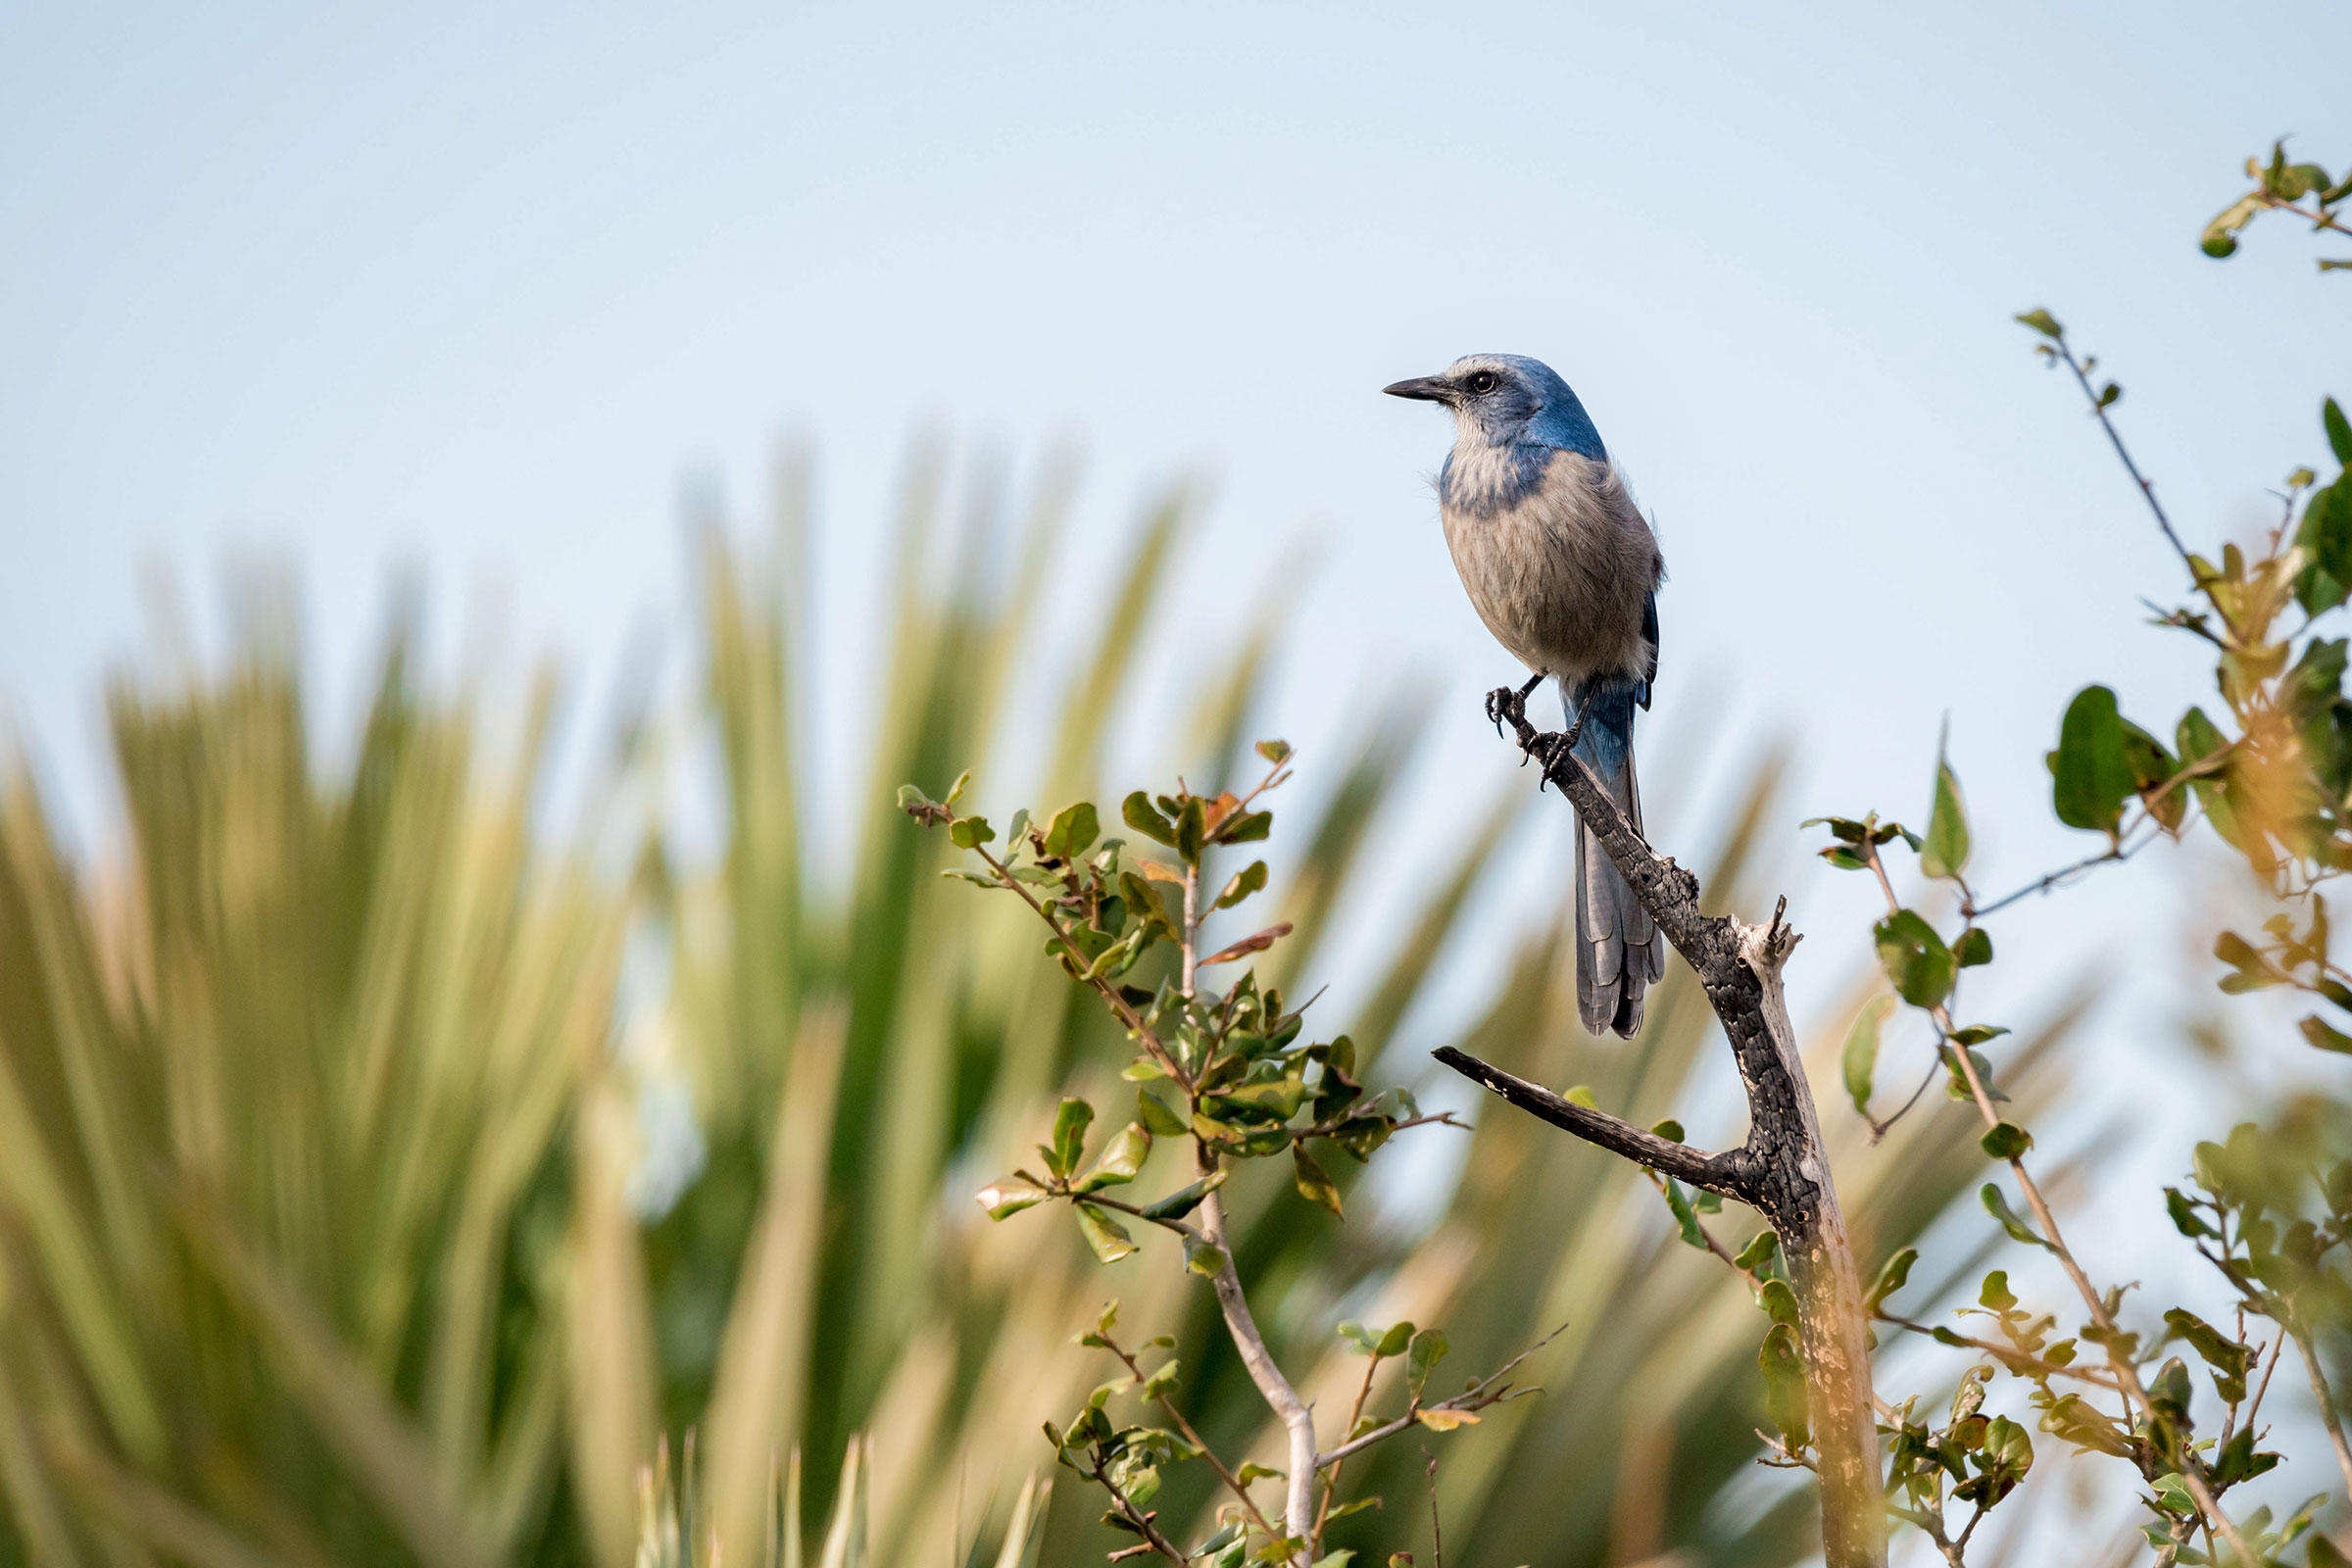 Florida Scrub-Jay in Merritt Island National Wildlife Refuge, Florida. Puffin's Pictures/Alamy